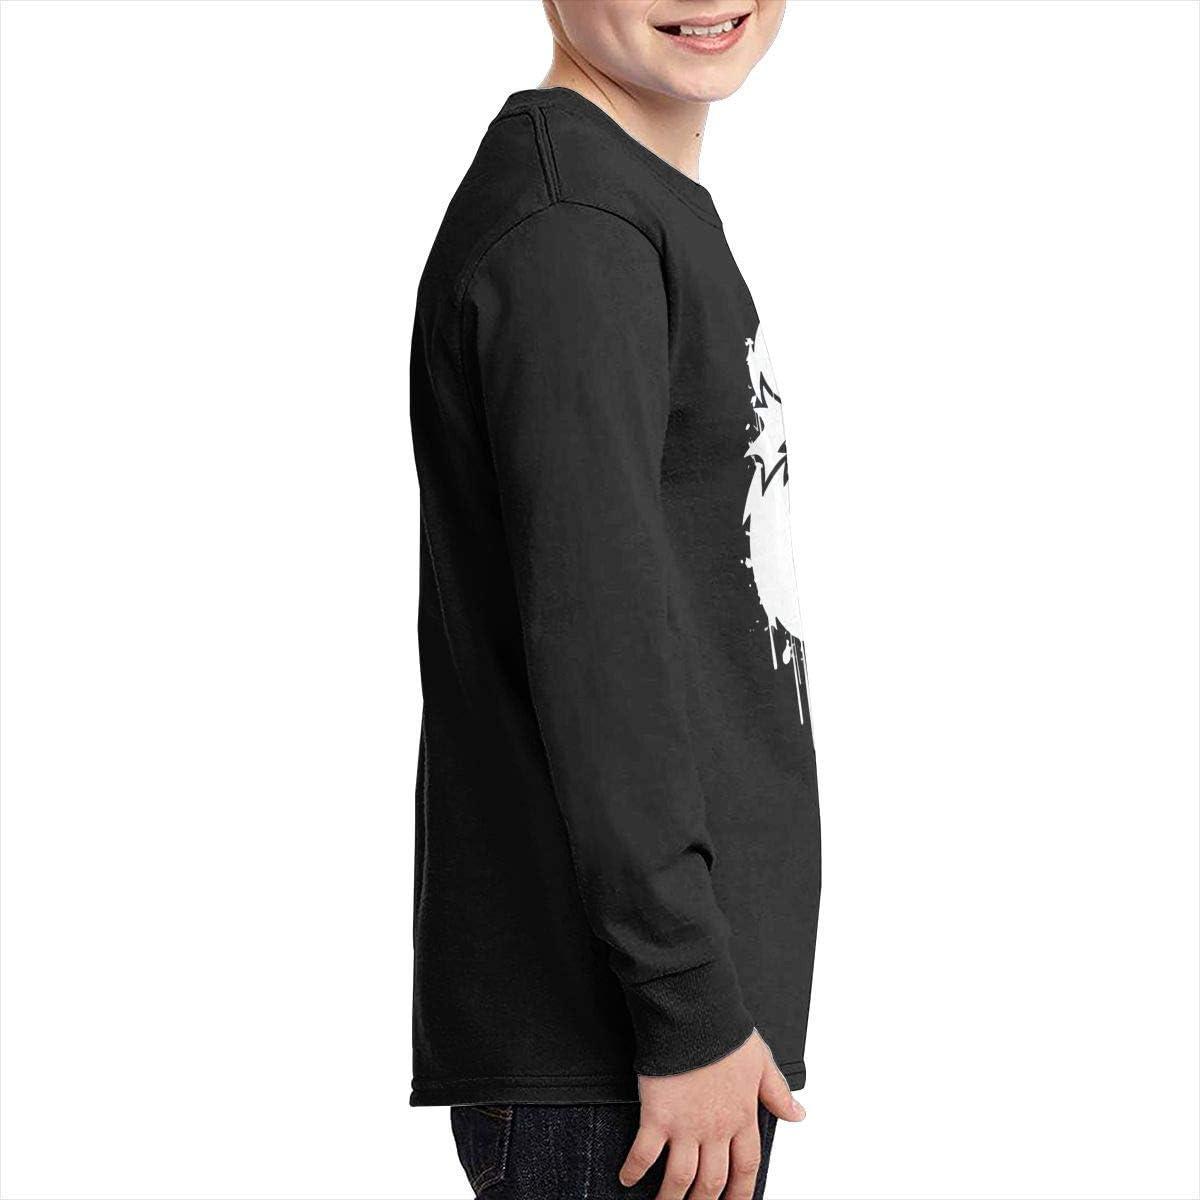 Kilsd Boys /& Girls Junior Vintage Dungeons /& Dragons Long Sleeve T Shirt Black